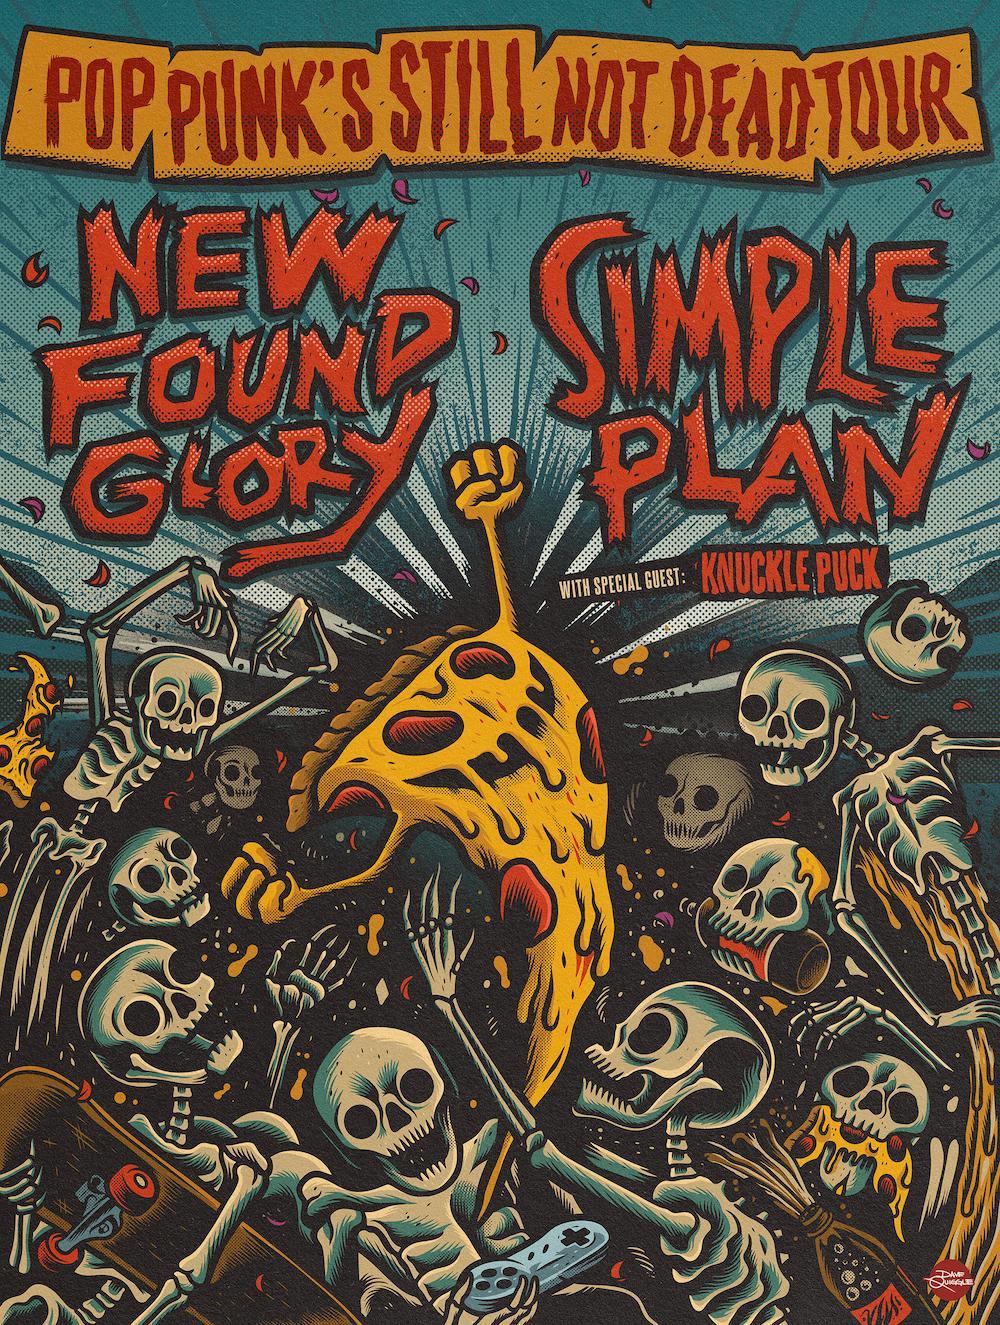 New Found Glory Simple Plan tour 2020